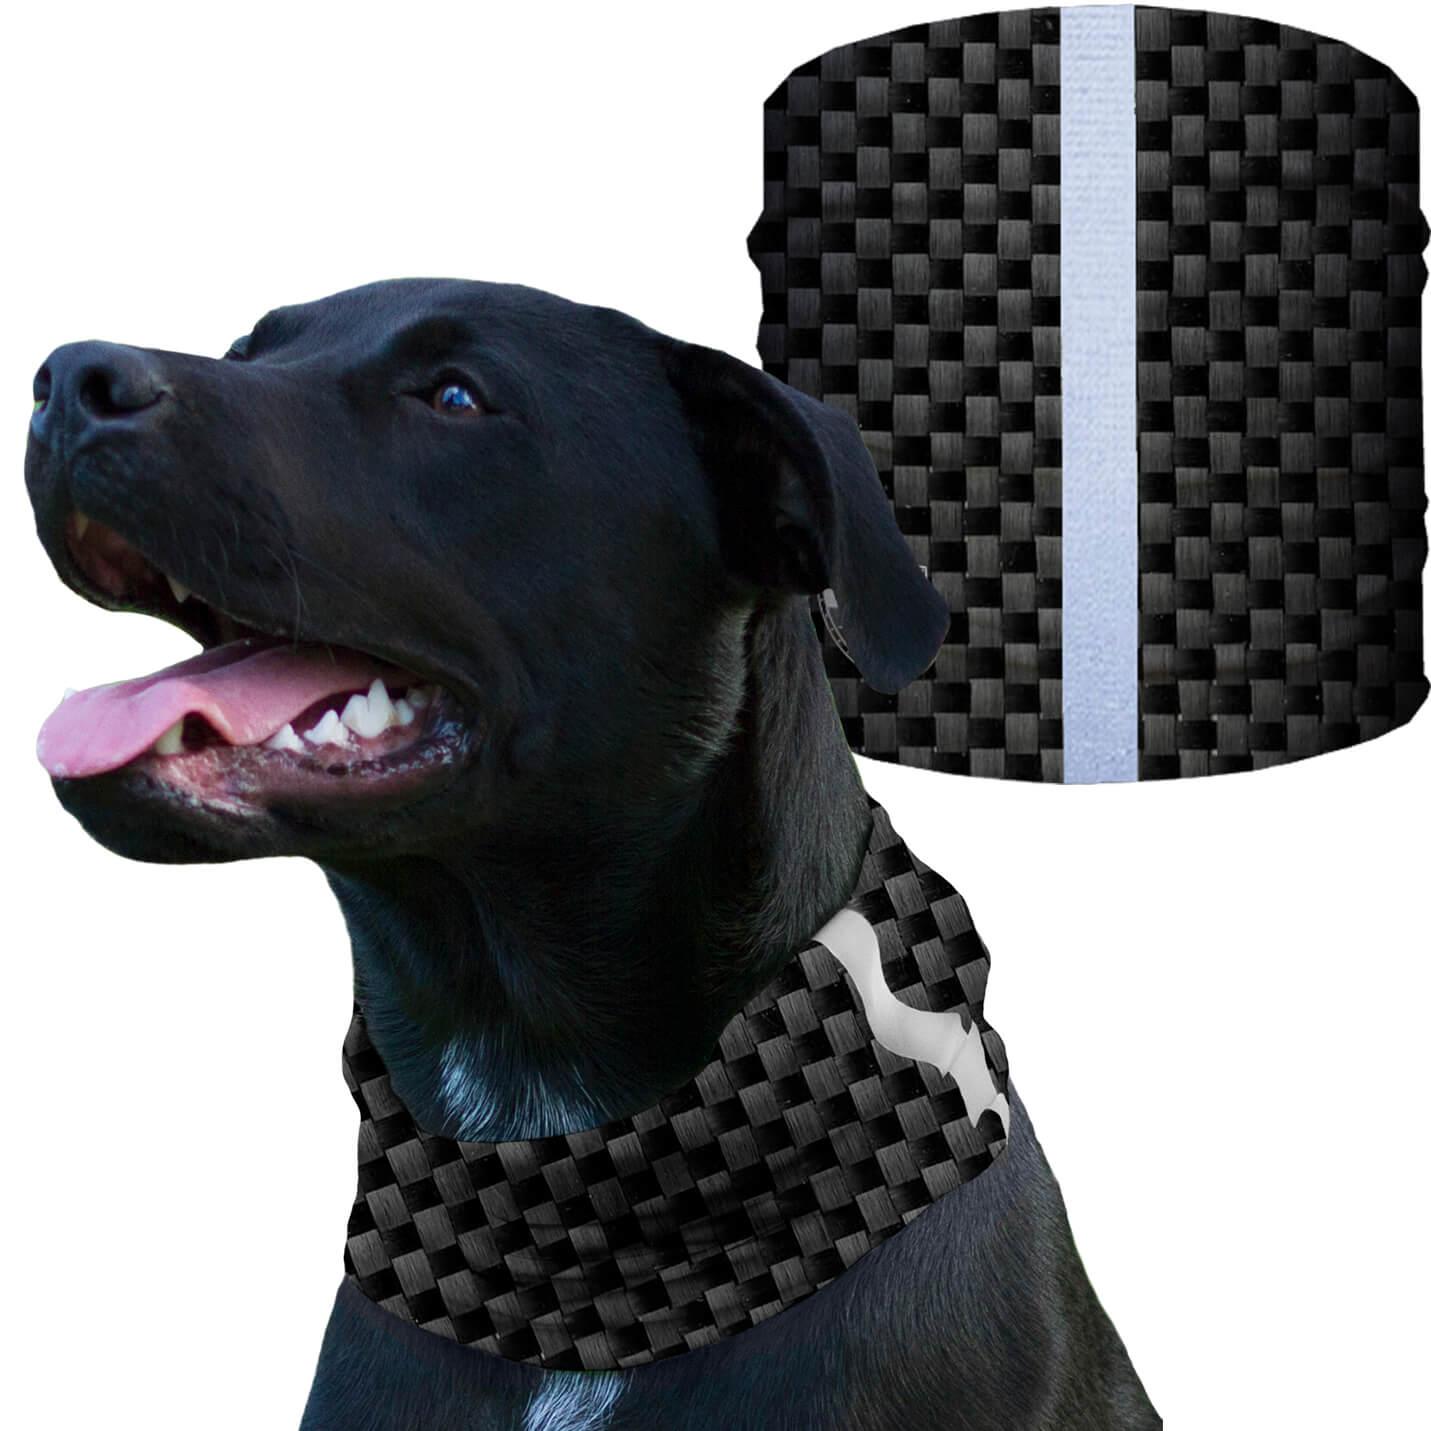 Dog Shields Carbon Fiber Dog Training Dogs Your Dog